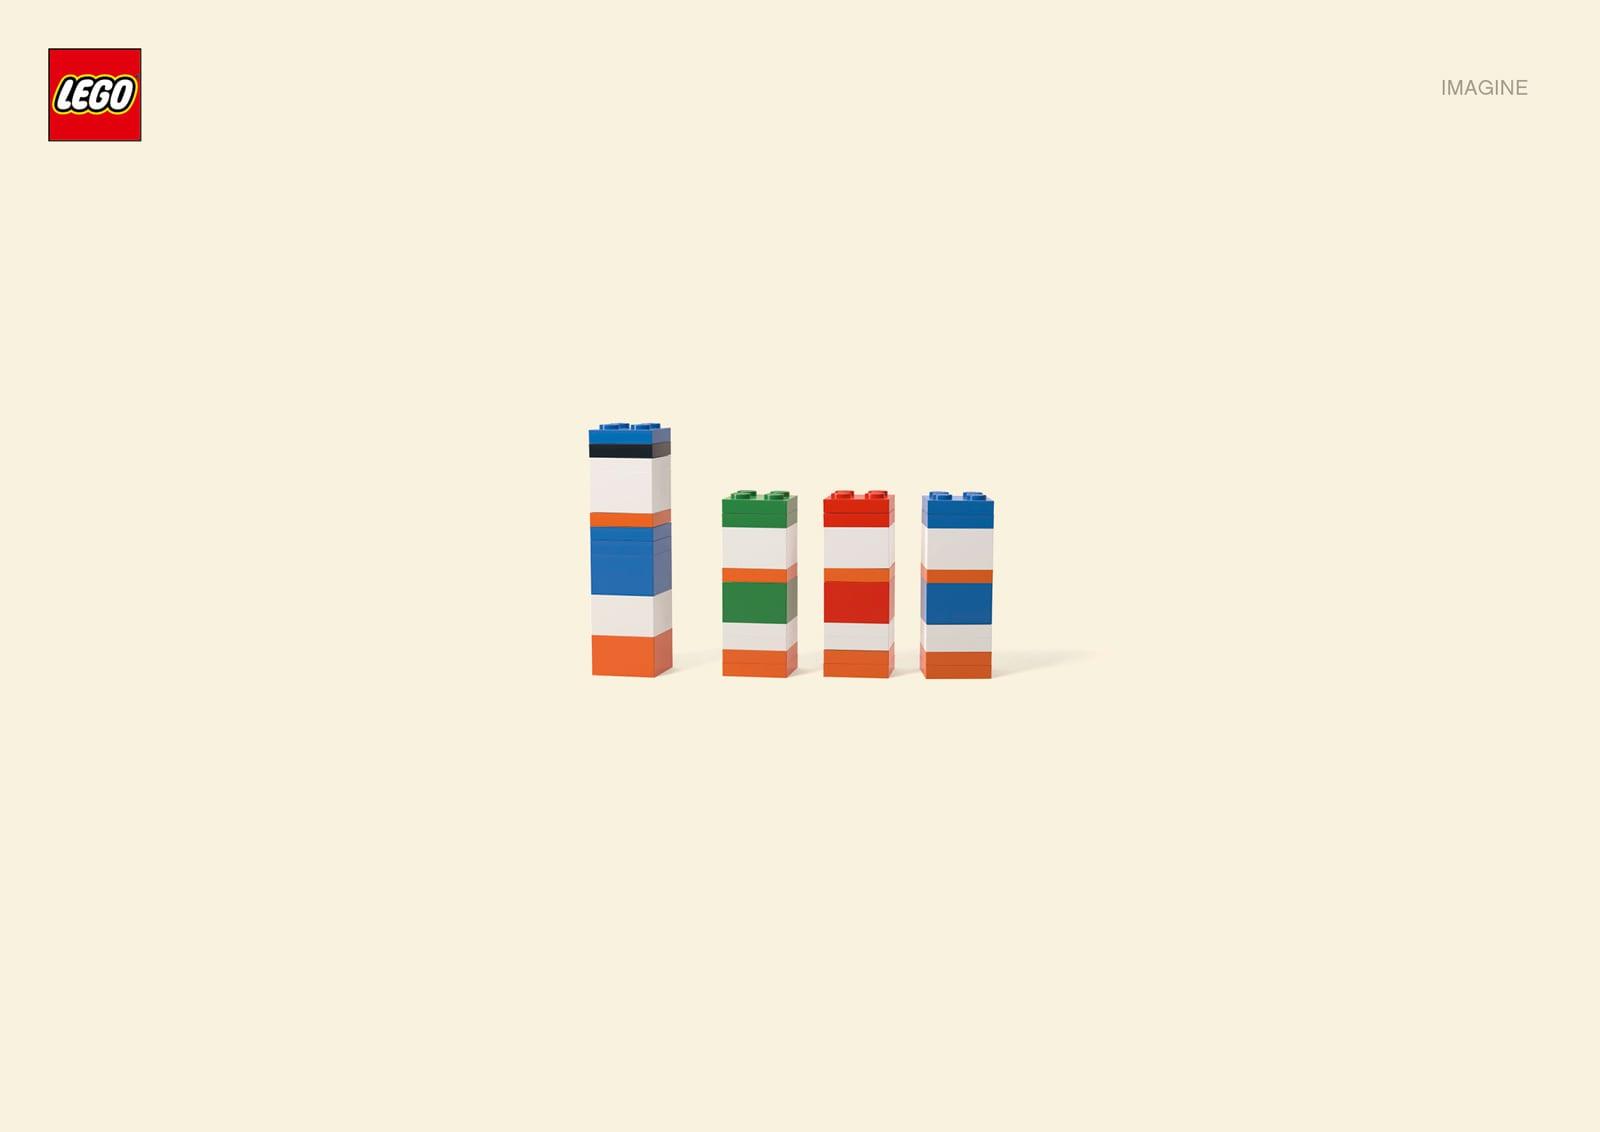 lego minimalista (3)